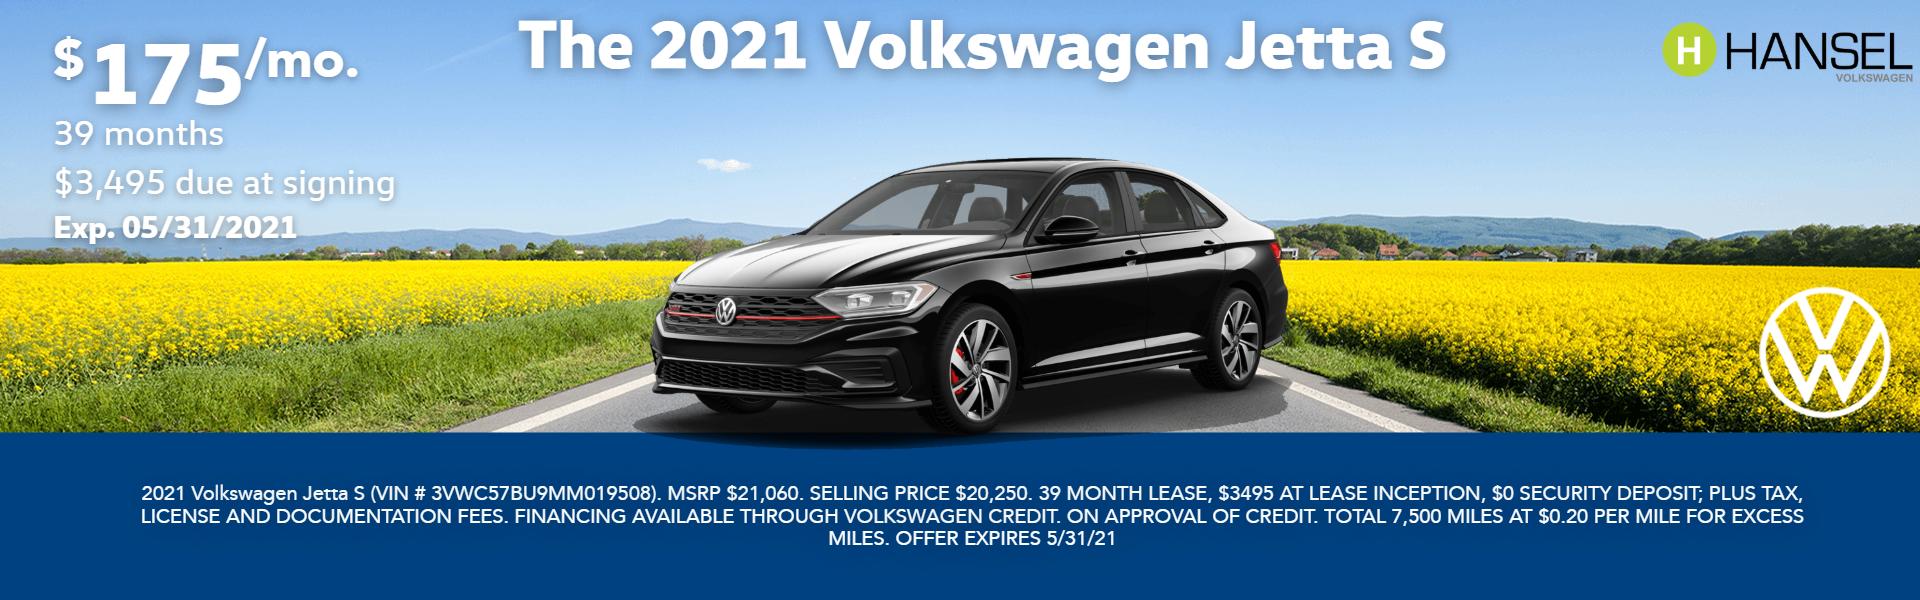 2021_Volkswagen_Jetta_GLI Autobahn_Mon May 10 2021 10_50_08 GMT-0700 (Pacific Daylight Time)